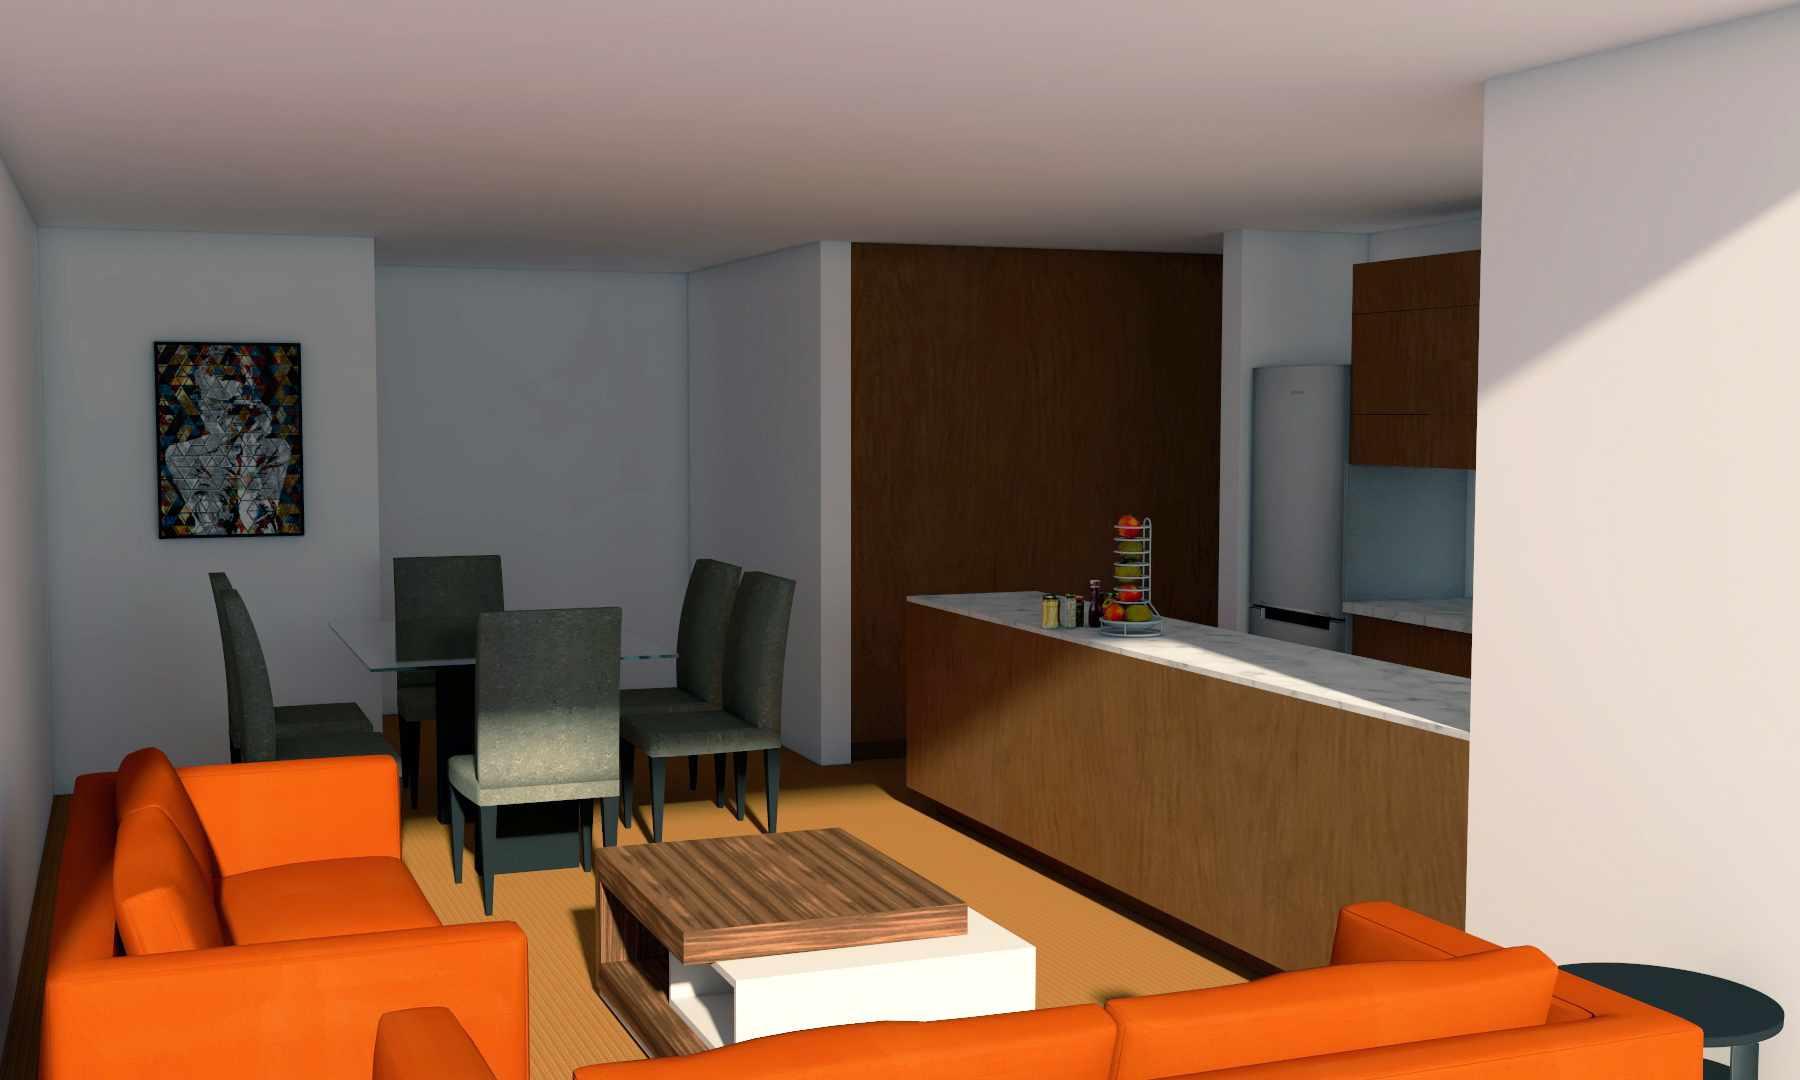 Departamento en Venta TORRE 501 - Calle 10, Esq Av. Costanera Foto 4